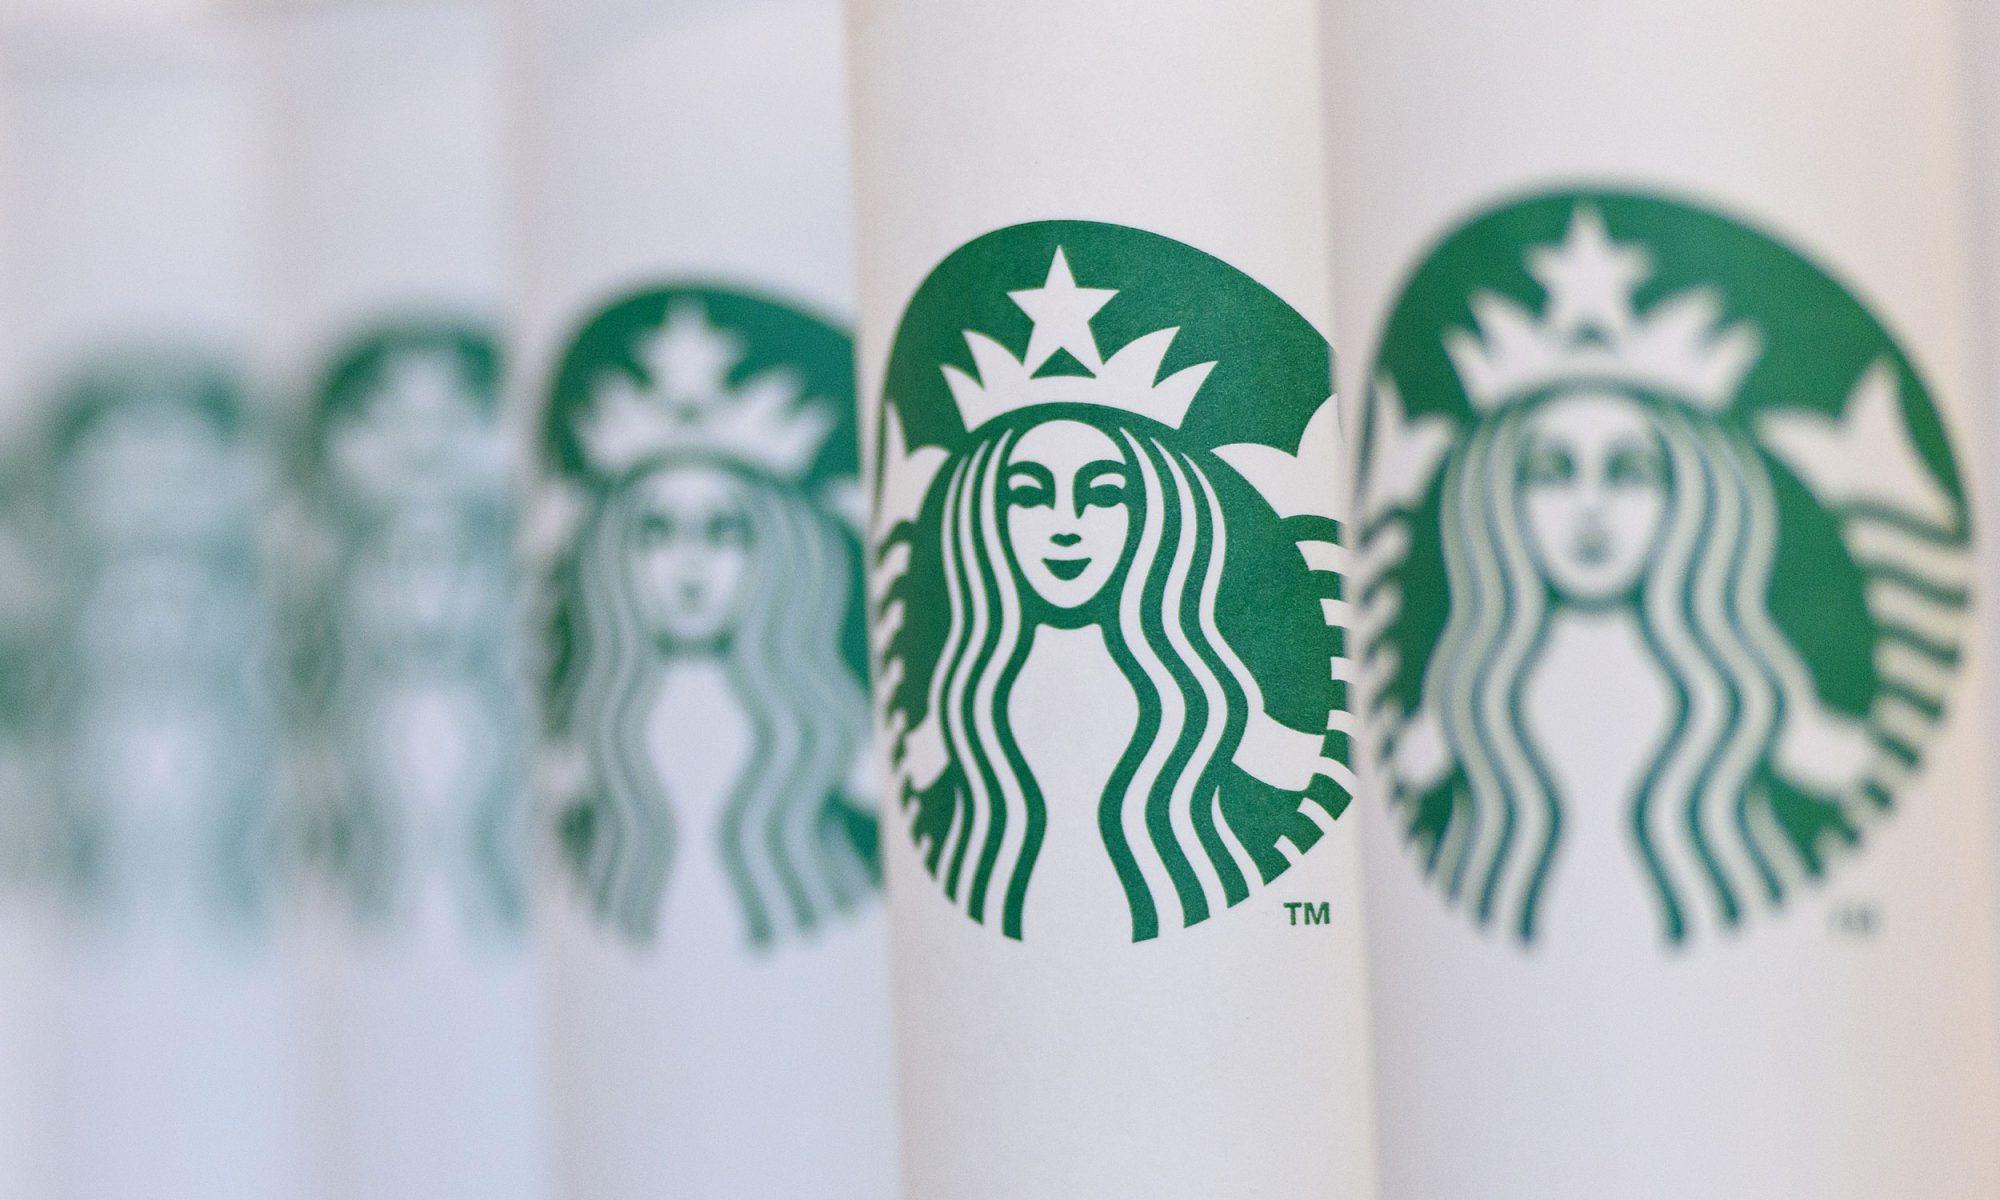 EC: How to Financially Hack Breakfast With the Starbucks Brunch Menu